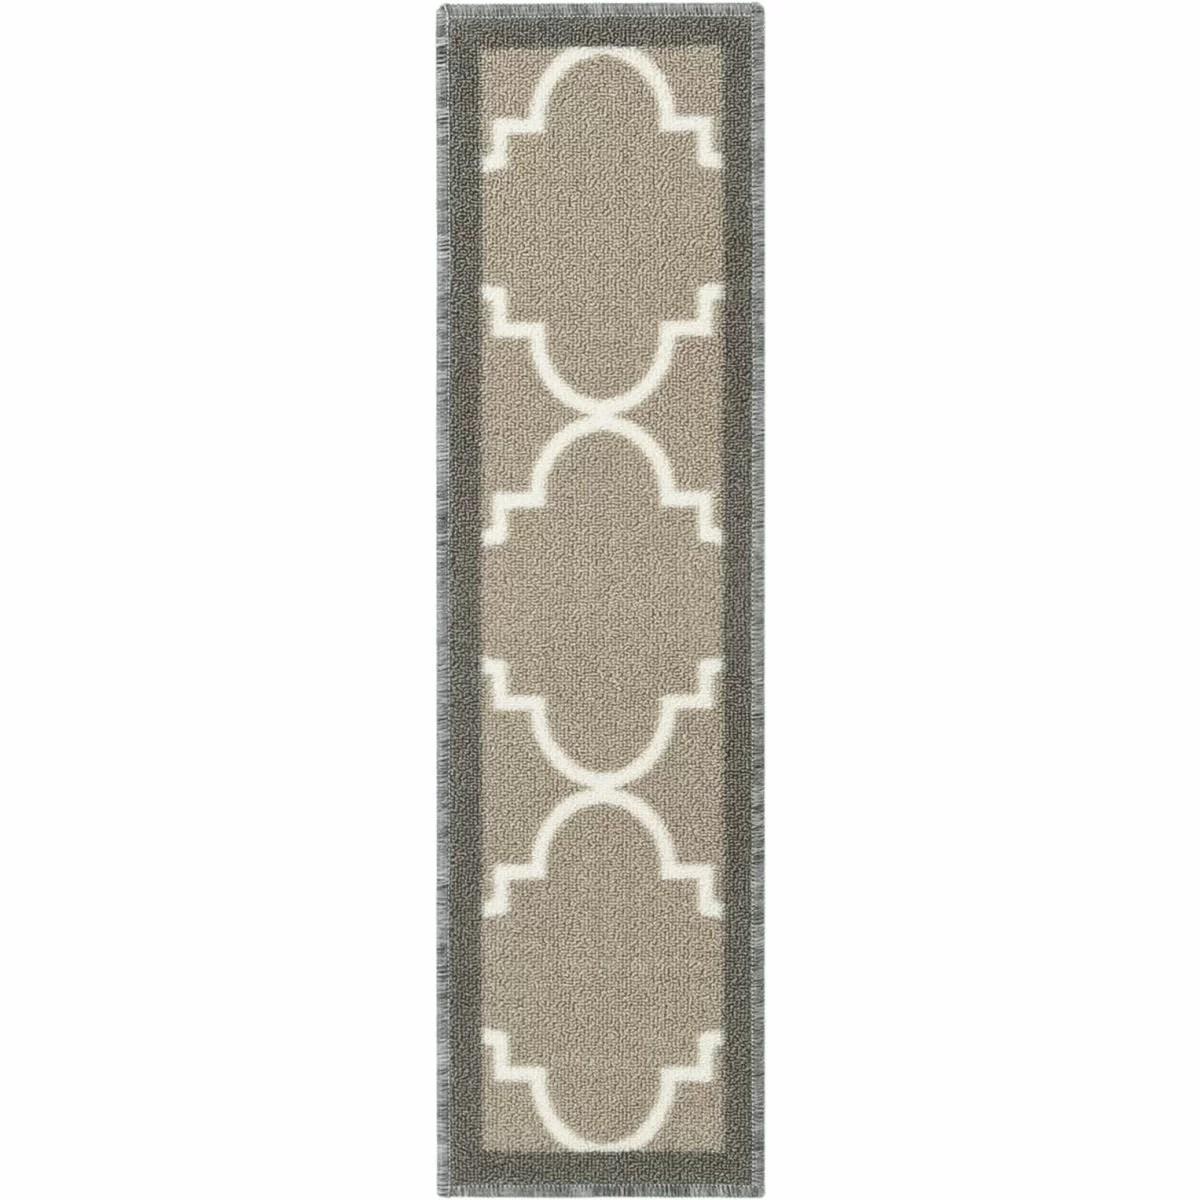 Well Woven Kings Court Brooklyn Trellis Lattice Non Skid Stair | Rug Stair Treads Non Slip | Vinyl Flooring | Skid Resistant | 8.5 X26 | Overstock | Mat